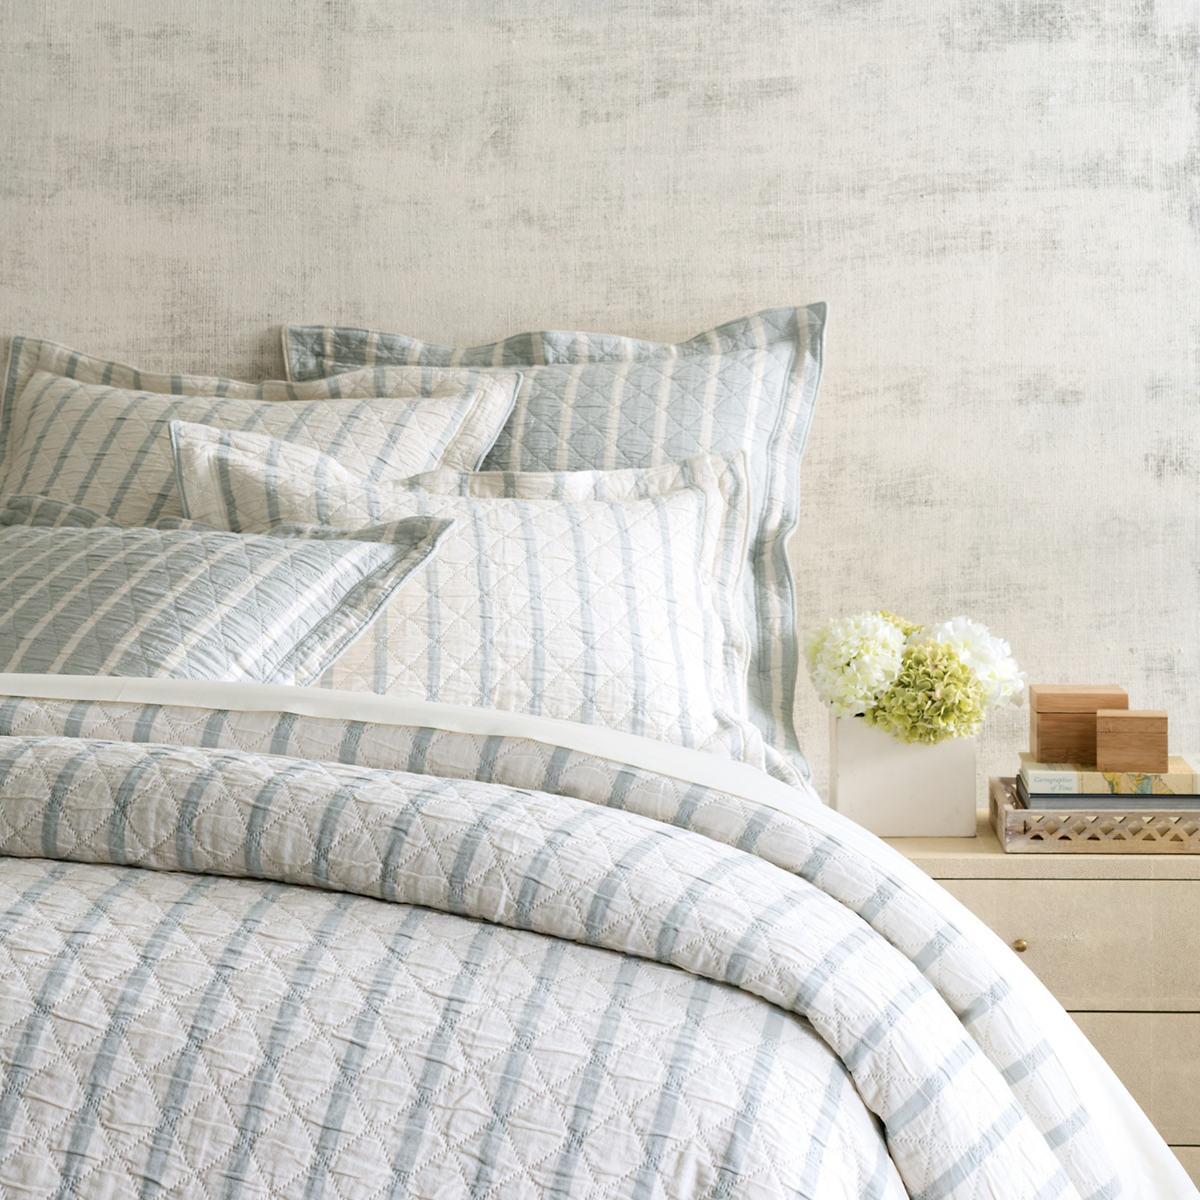 pine cone hill u003e bedding wainscott sky reversible matelass coverlet - Pine Cone Hill Bedding